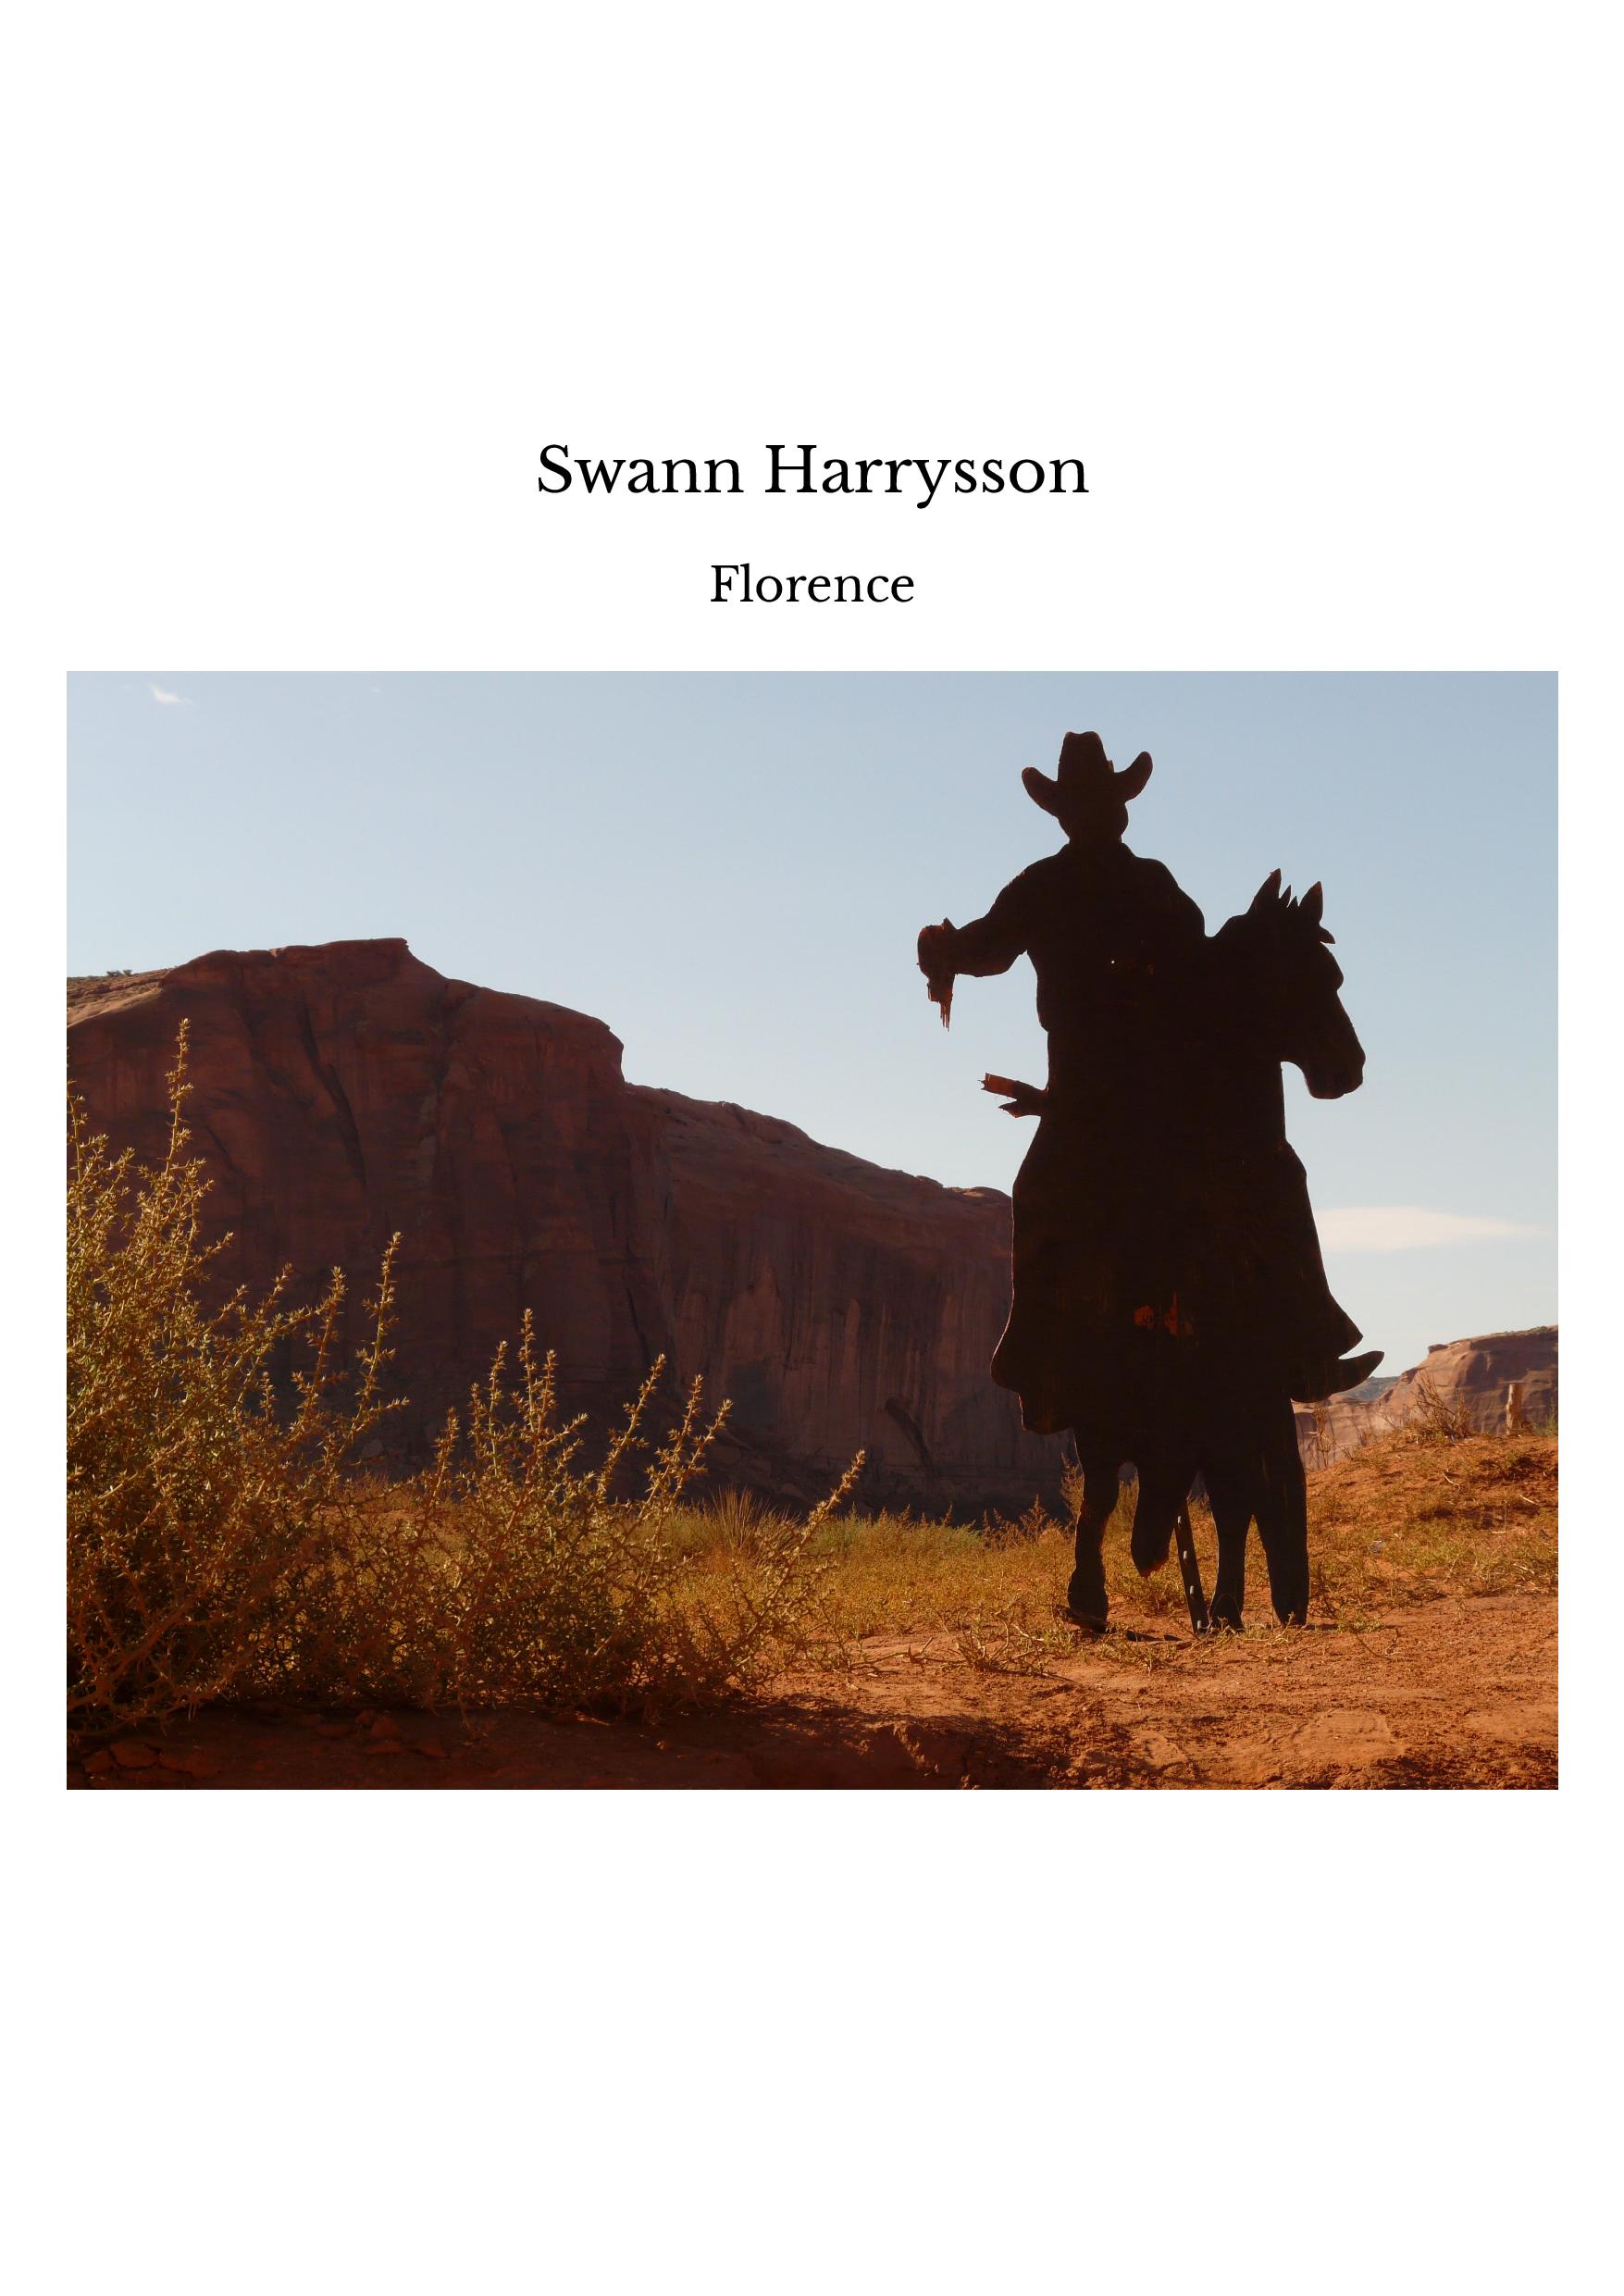 Swann Harrysson